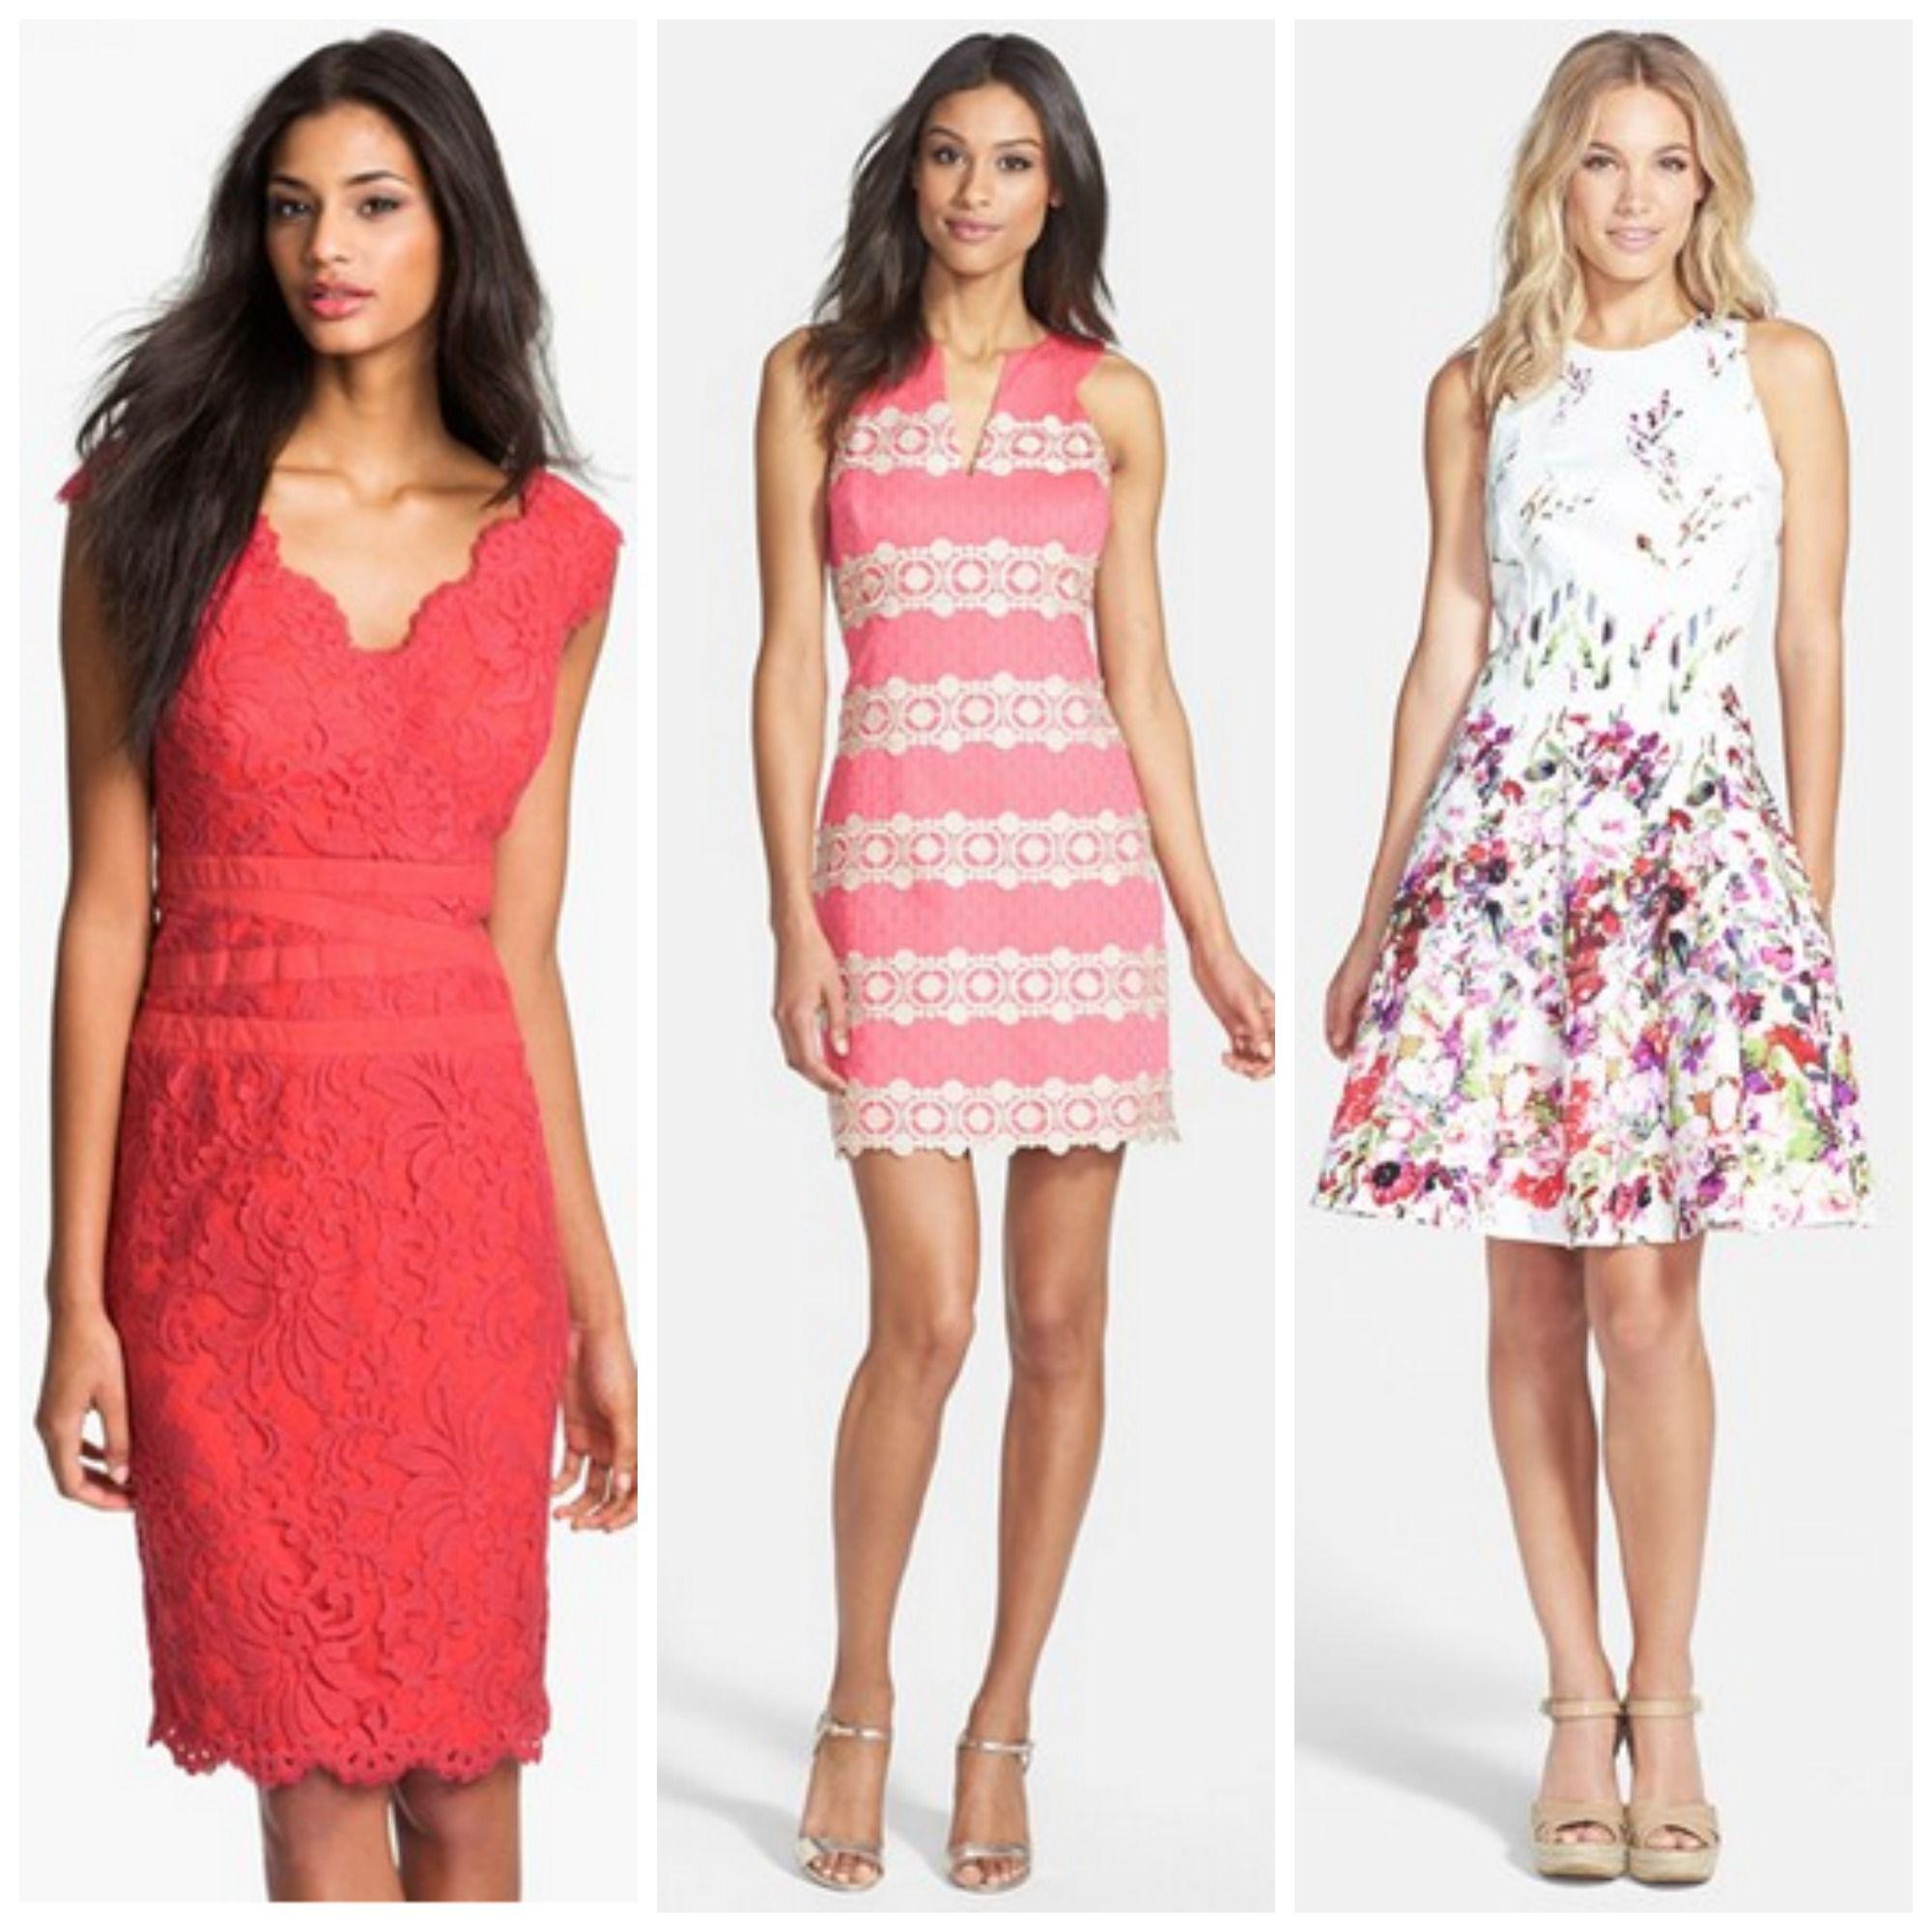 dresses for summer wedding Daytime Semi Formal Wedding Guest Attire Events Outfits Summer Wedding Guest DressesSummer